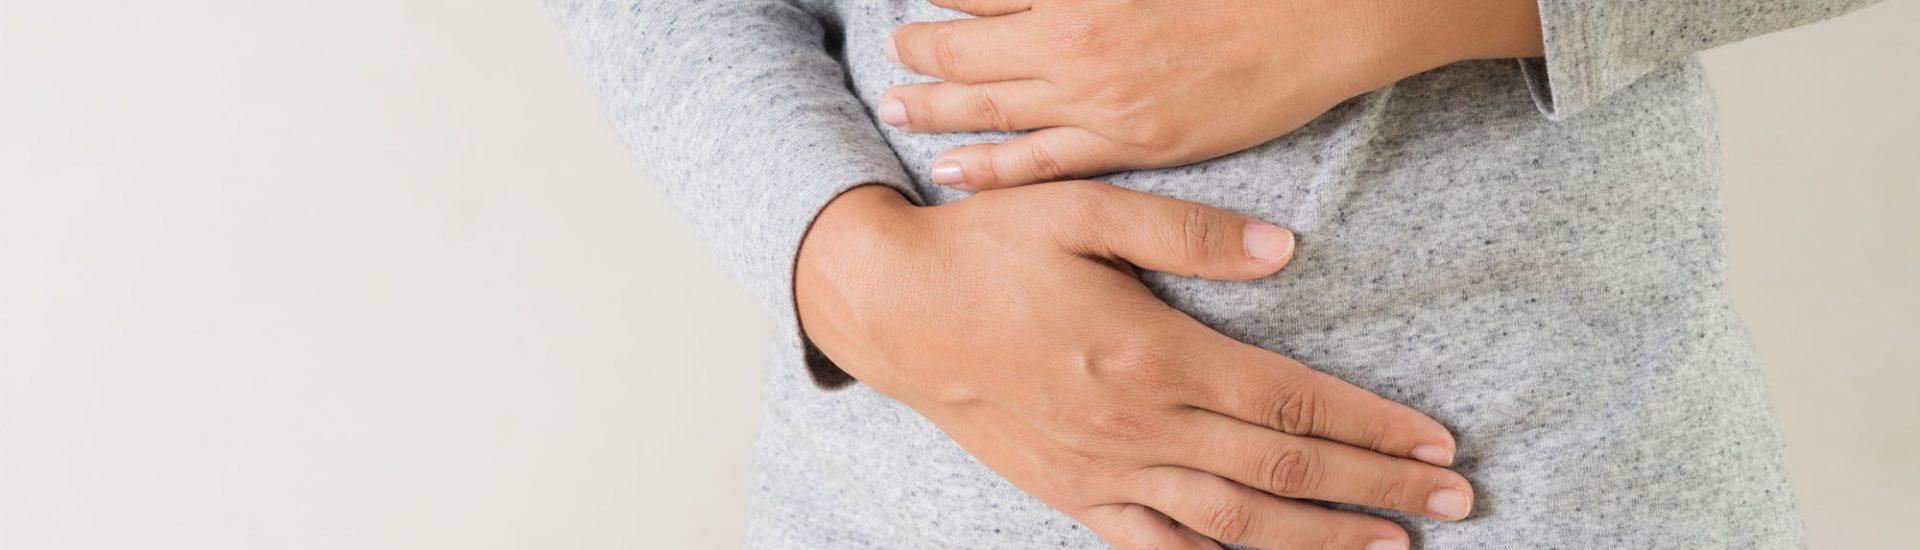 Unterleibsschmerzen: Ursachen, wann zum Arzt? Untersuchung